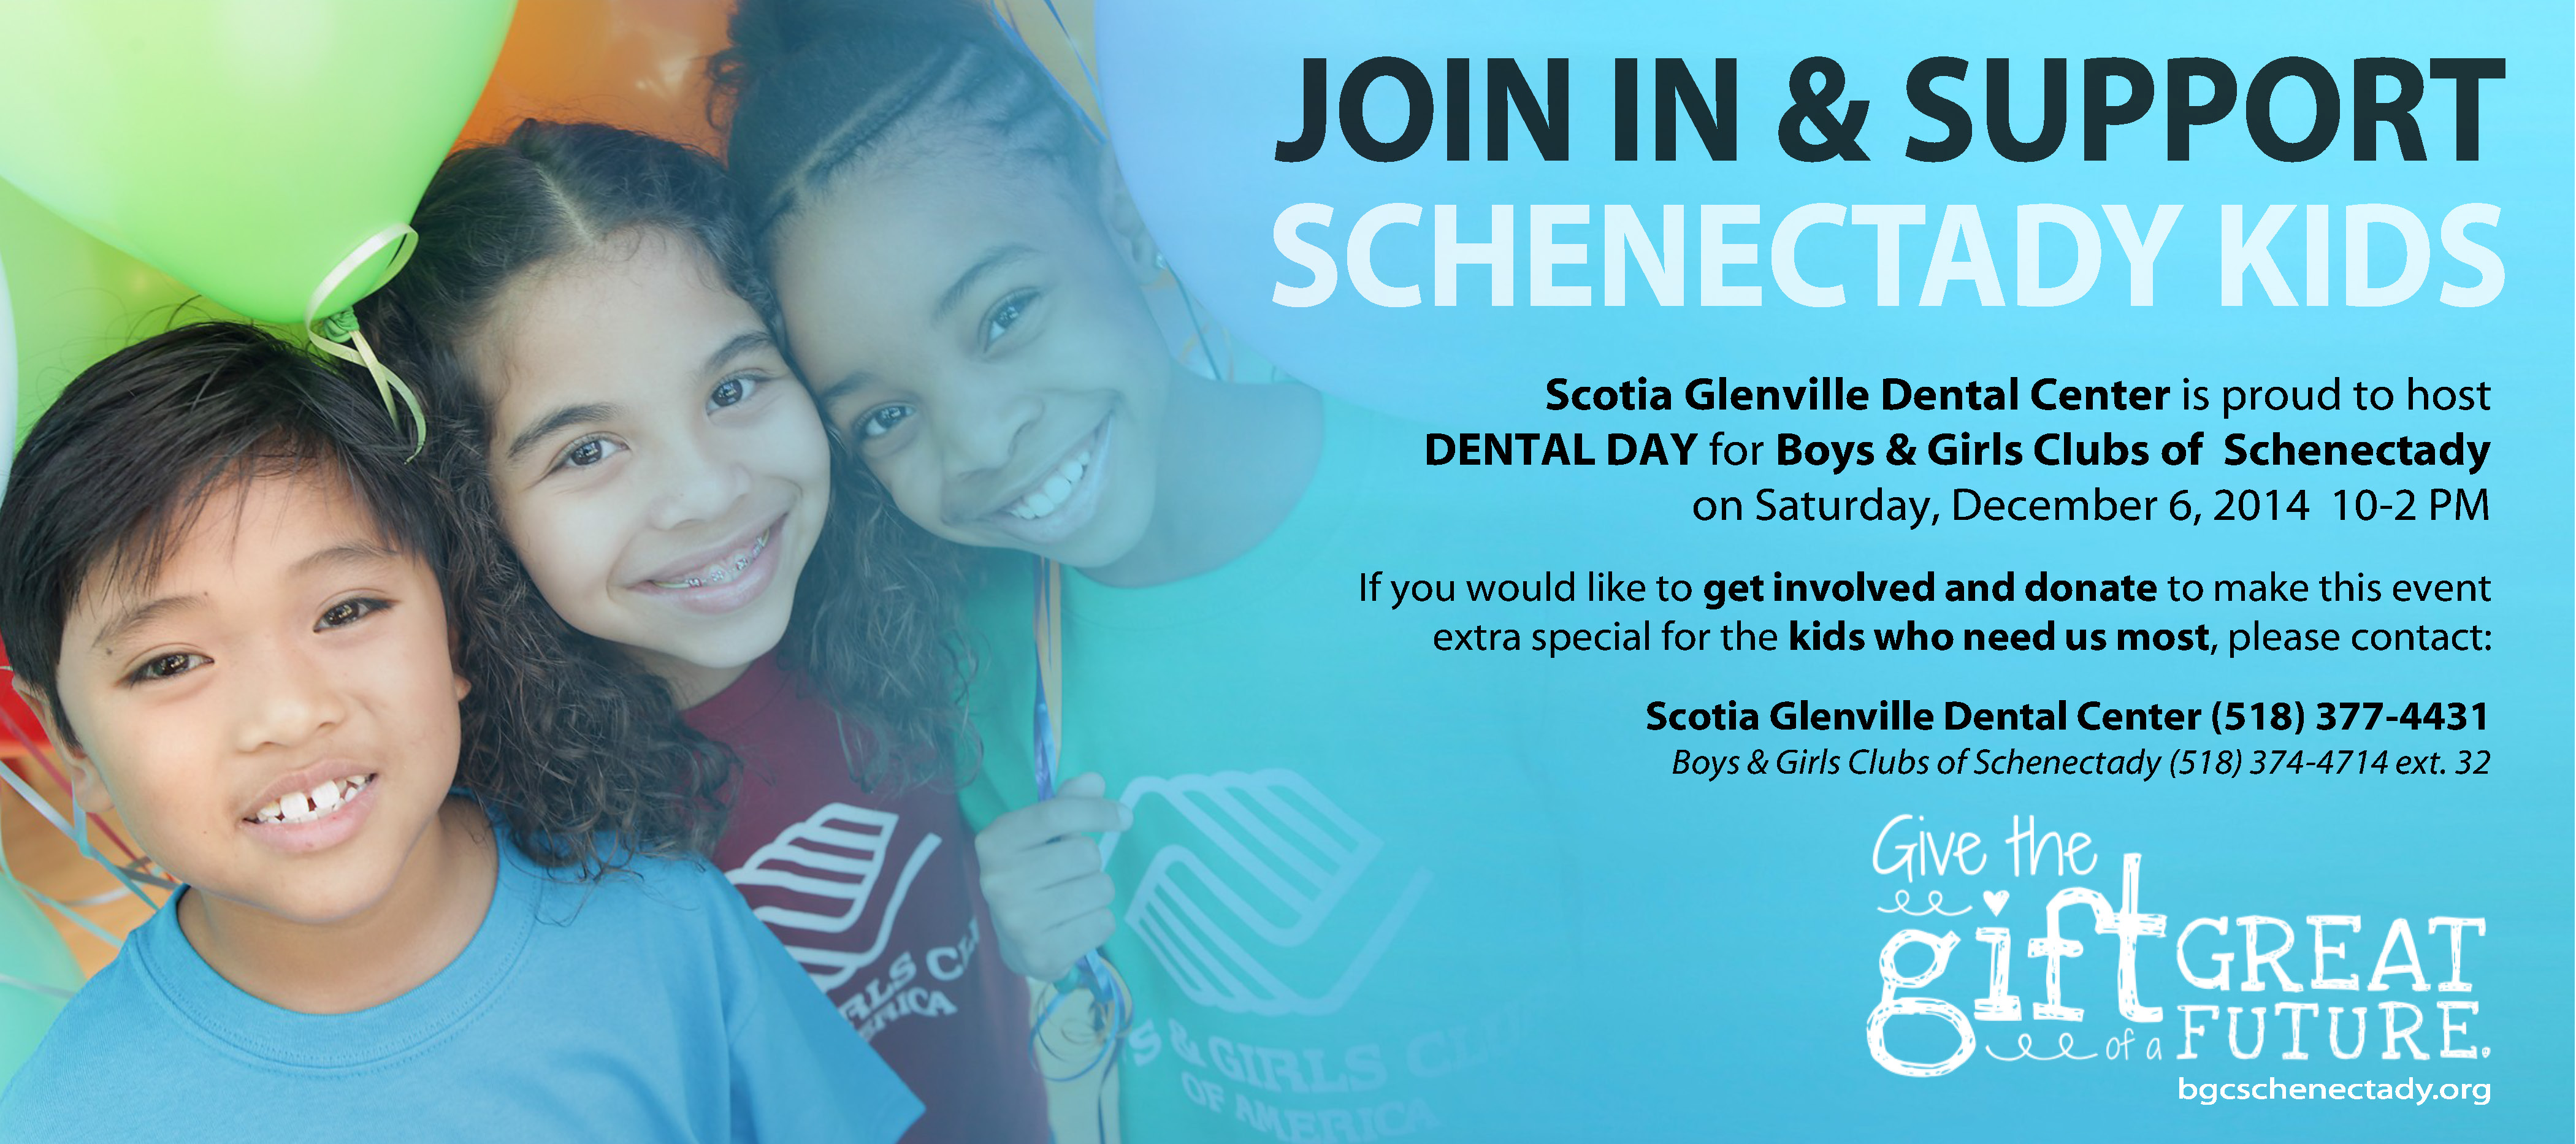 Scotia Glenville Dental Center Dental Day Ad.jpg